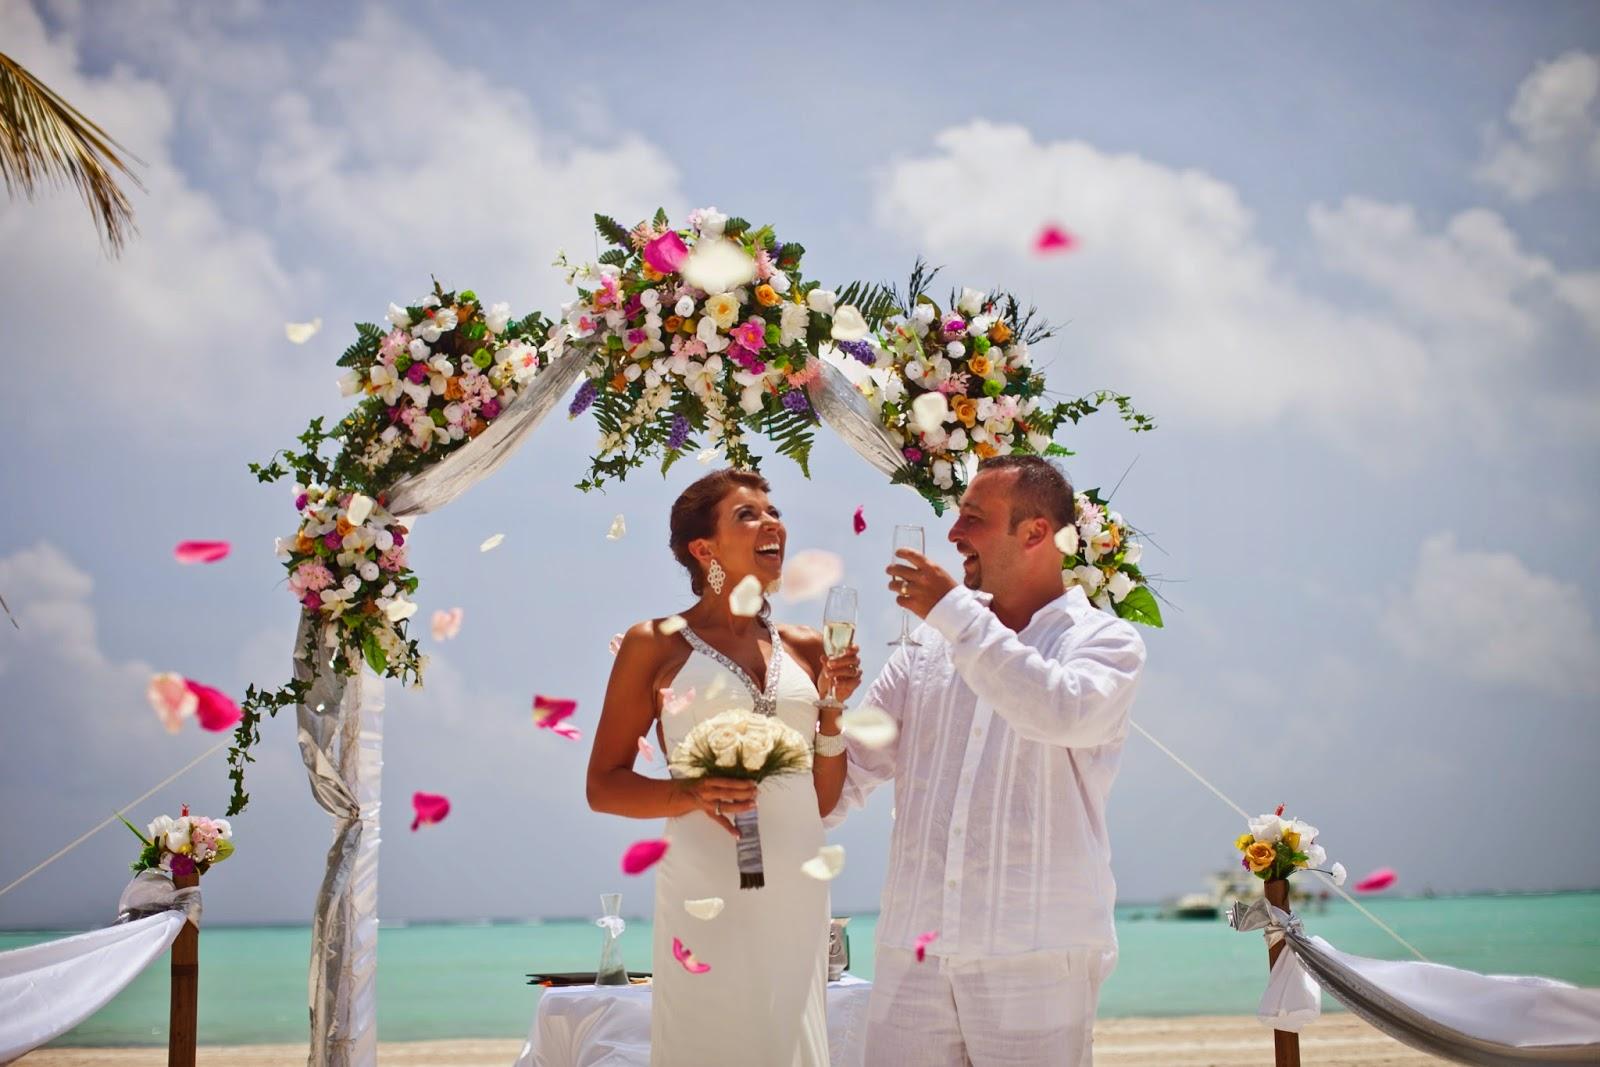 Matrimonio Simbolico Punta Cana : Quieres casarte en república dominicana ¡te damos toda